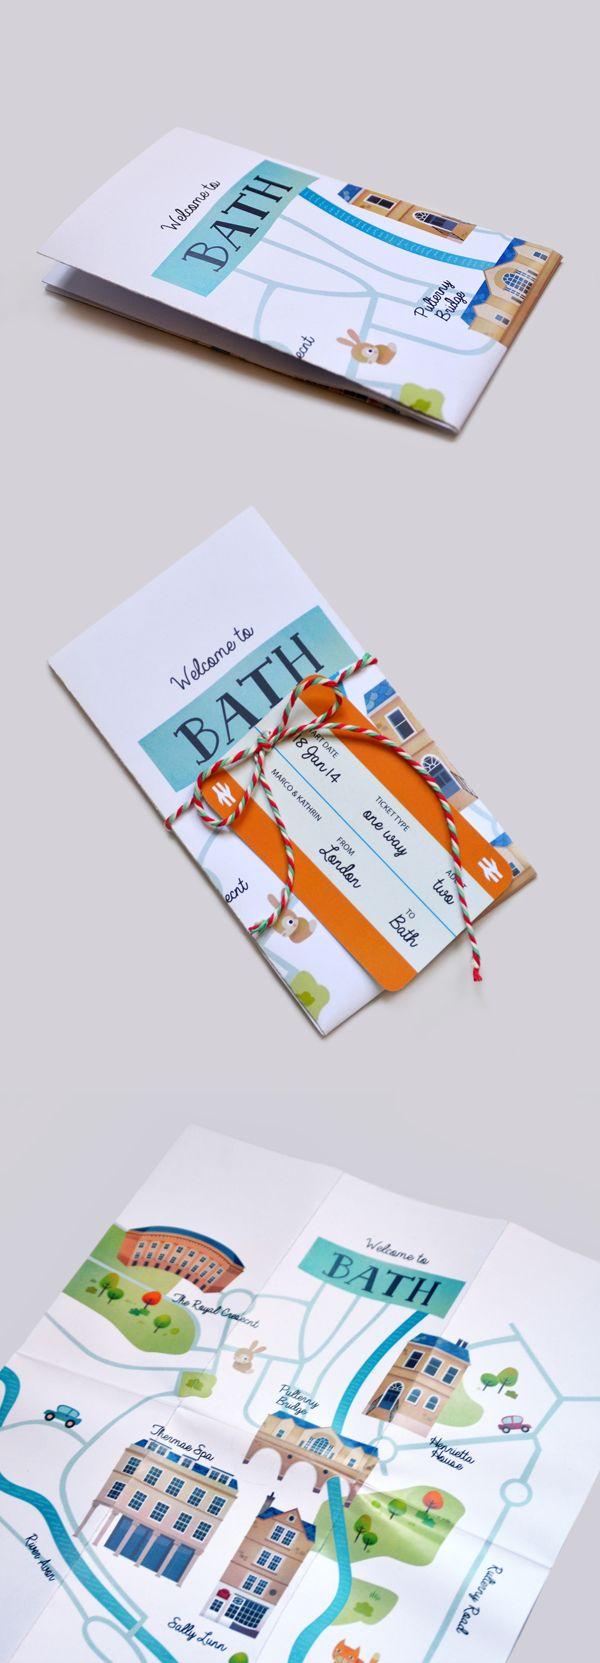 Bath Map Design on Behance